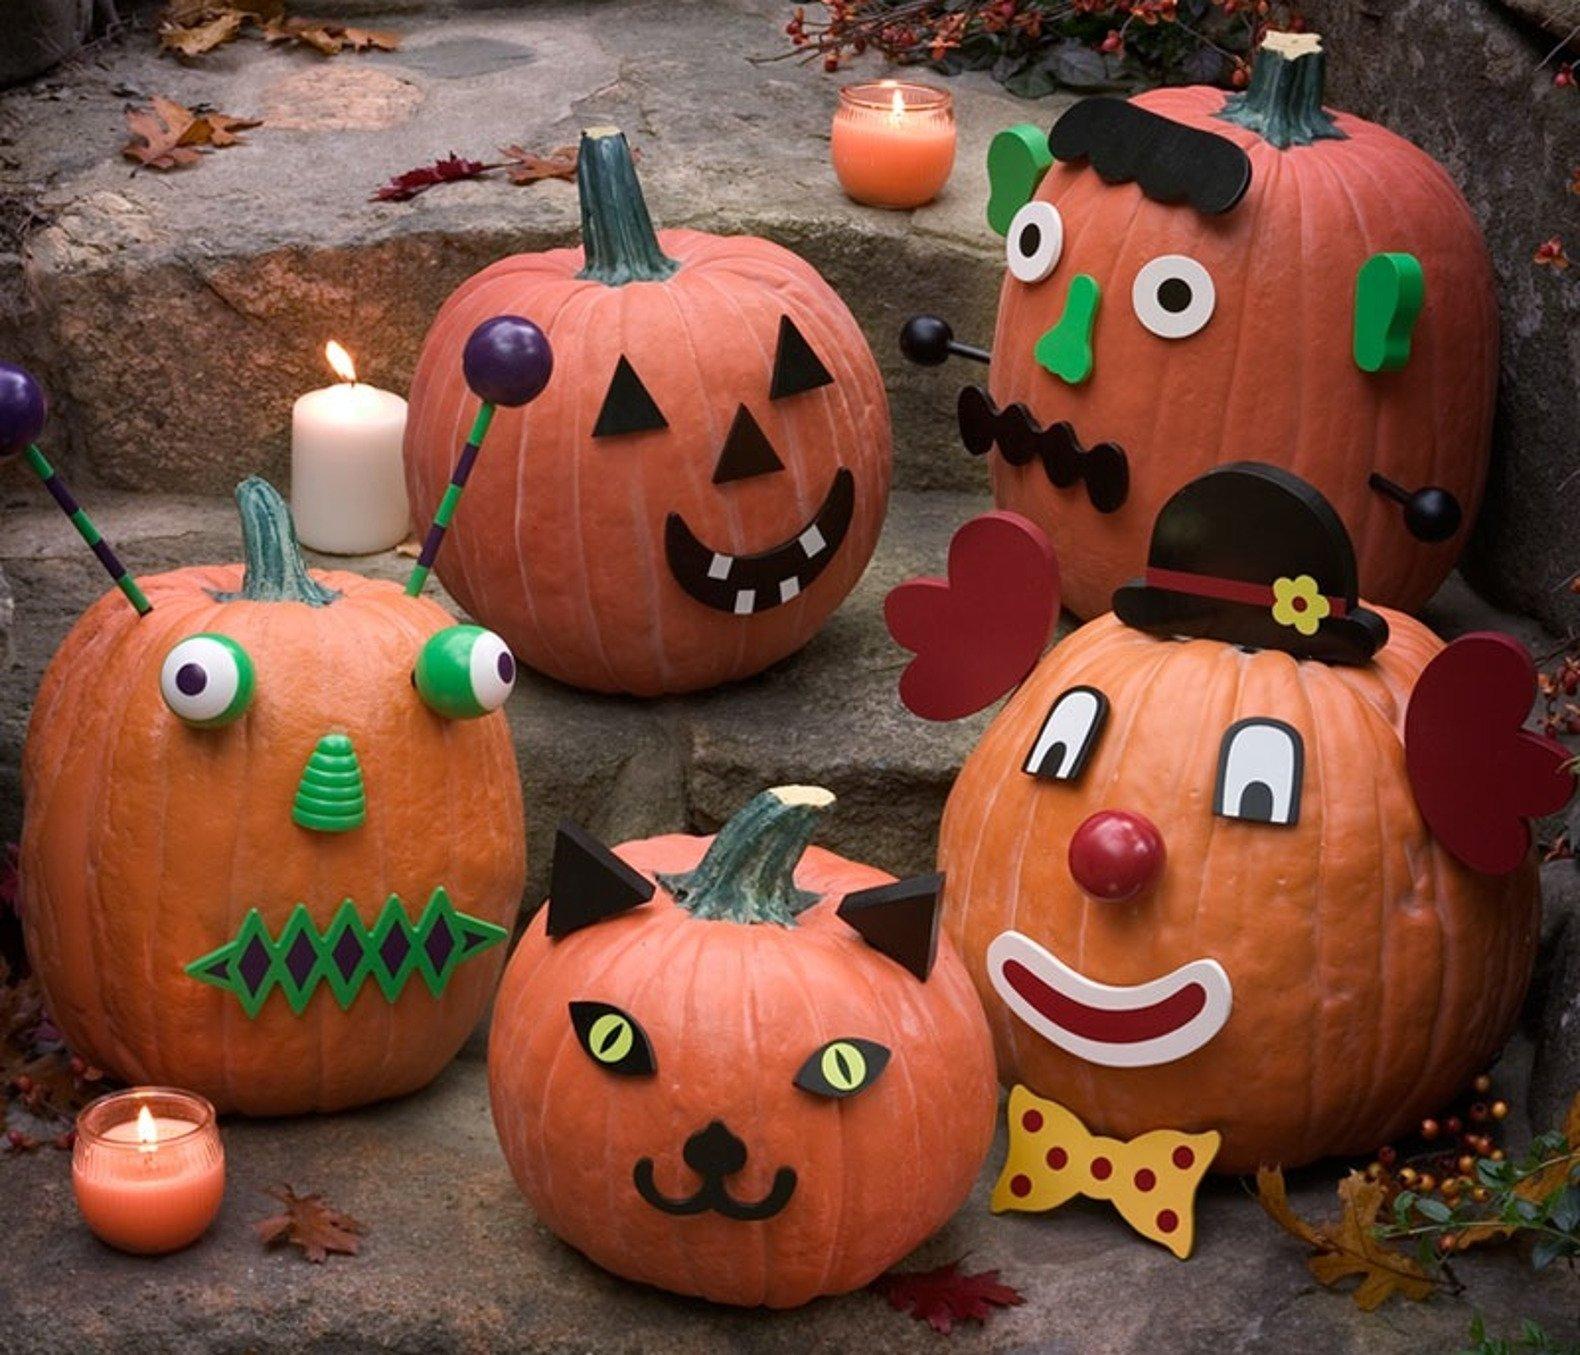 10 Most Recommended Pumpkin Decorating Ideas For Kids pumpkins inhabitat green design innovation architecture green 2020